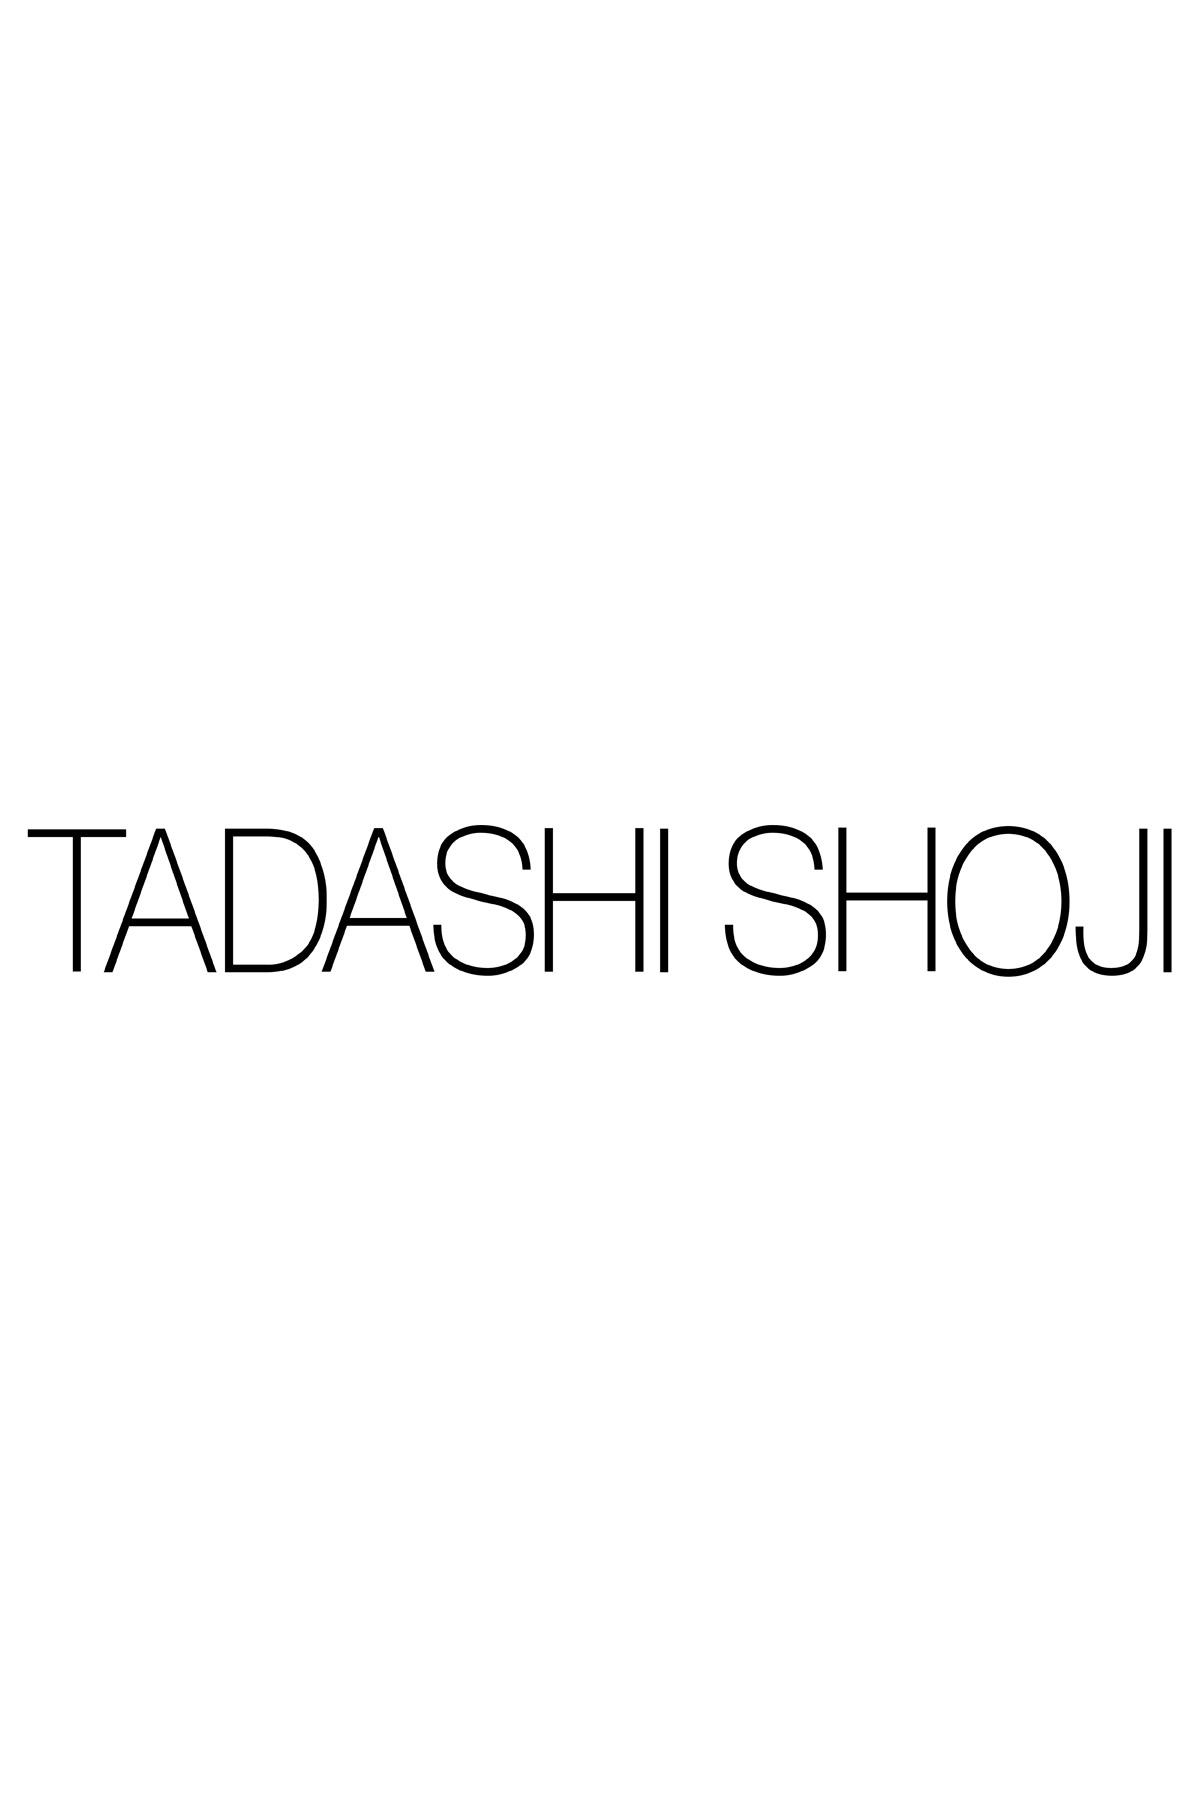 Tadashi Shoji - Buzen Gown - Detail